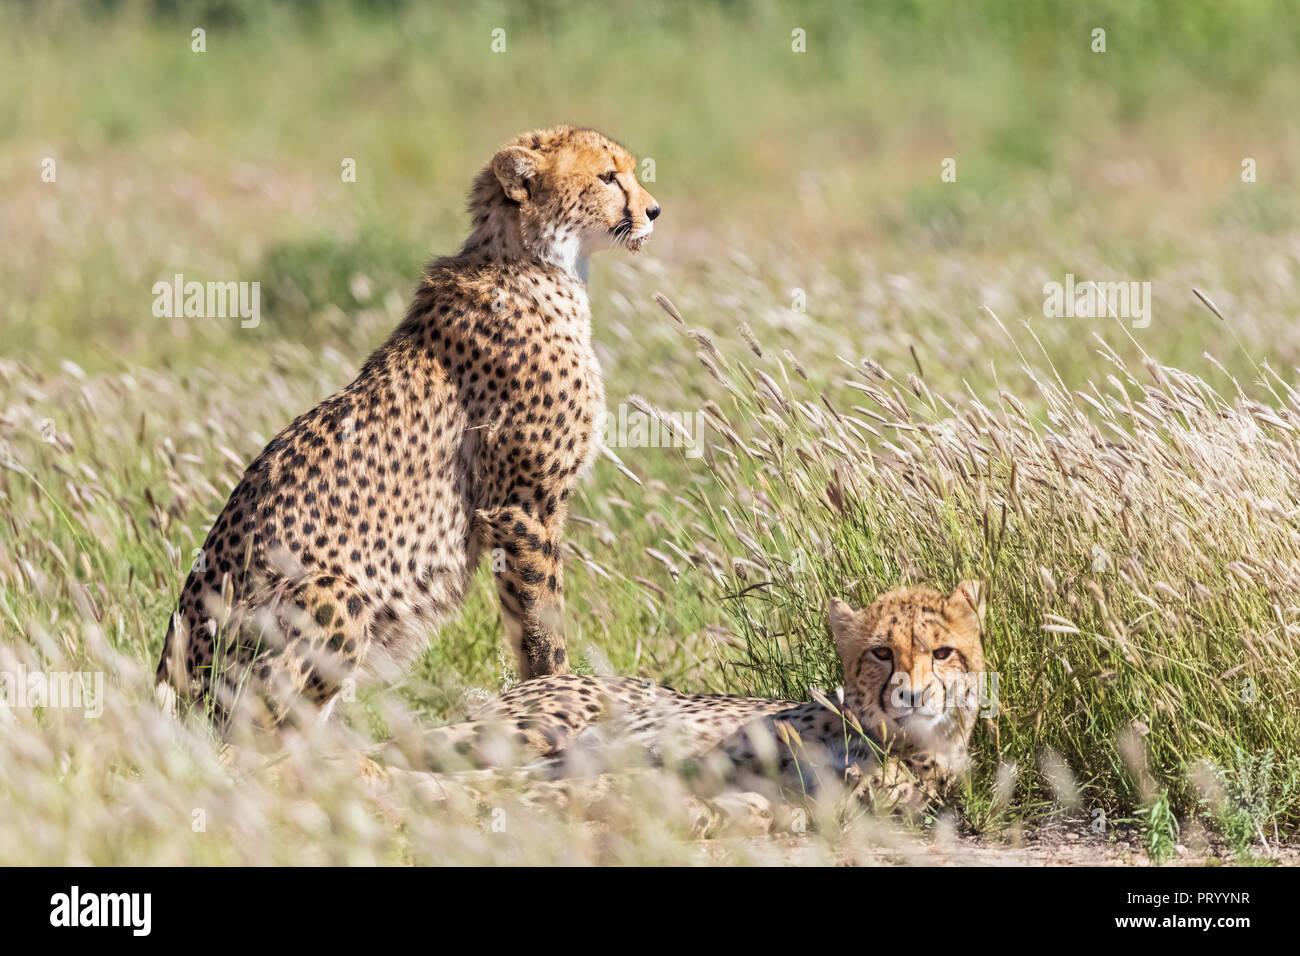 Botswana, Kgalagadi Transfrontier Park, Cheetahs, Acinonyx Jubatus - Stock Image